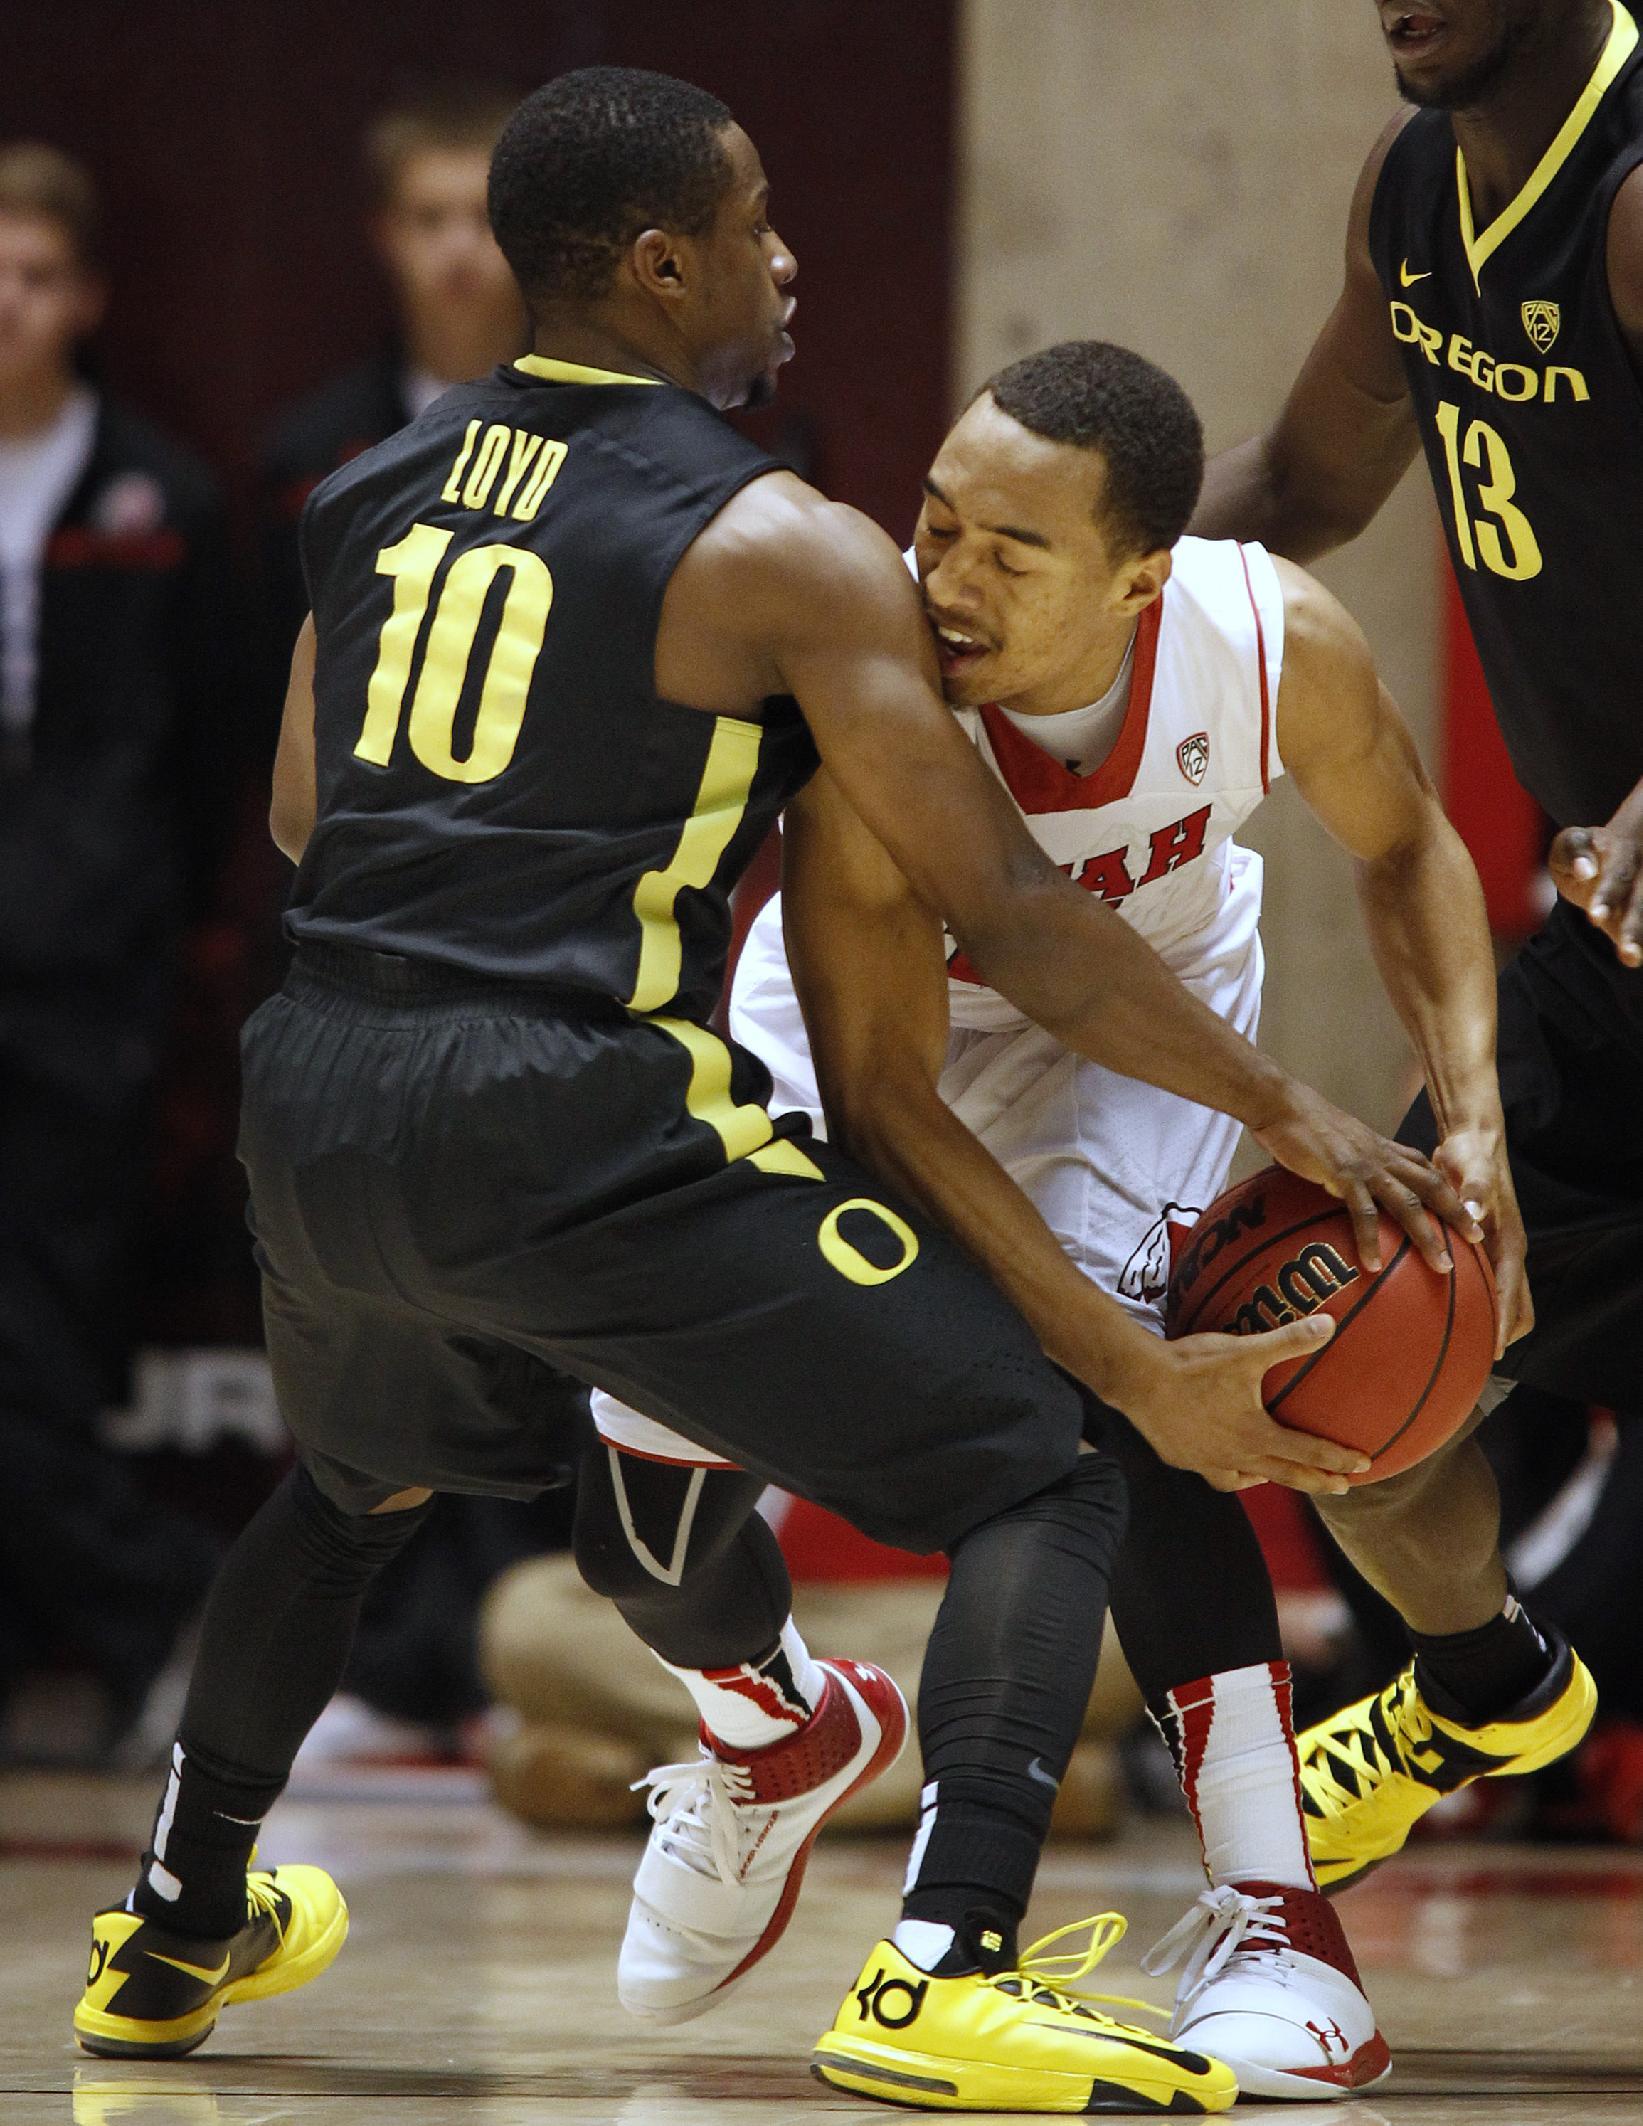 Oregon's Jonathan Loyd, left, reaches in to defend Utah's Brandon Taylor during an NCAA college basketball game in Salt Lake City, Thursday, Jan. 2, 2014. Oregon beat Utah in overtime, 70-68